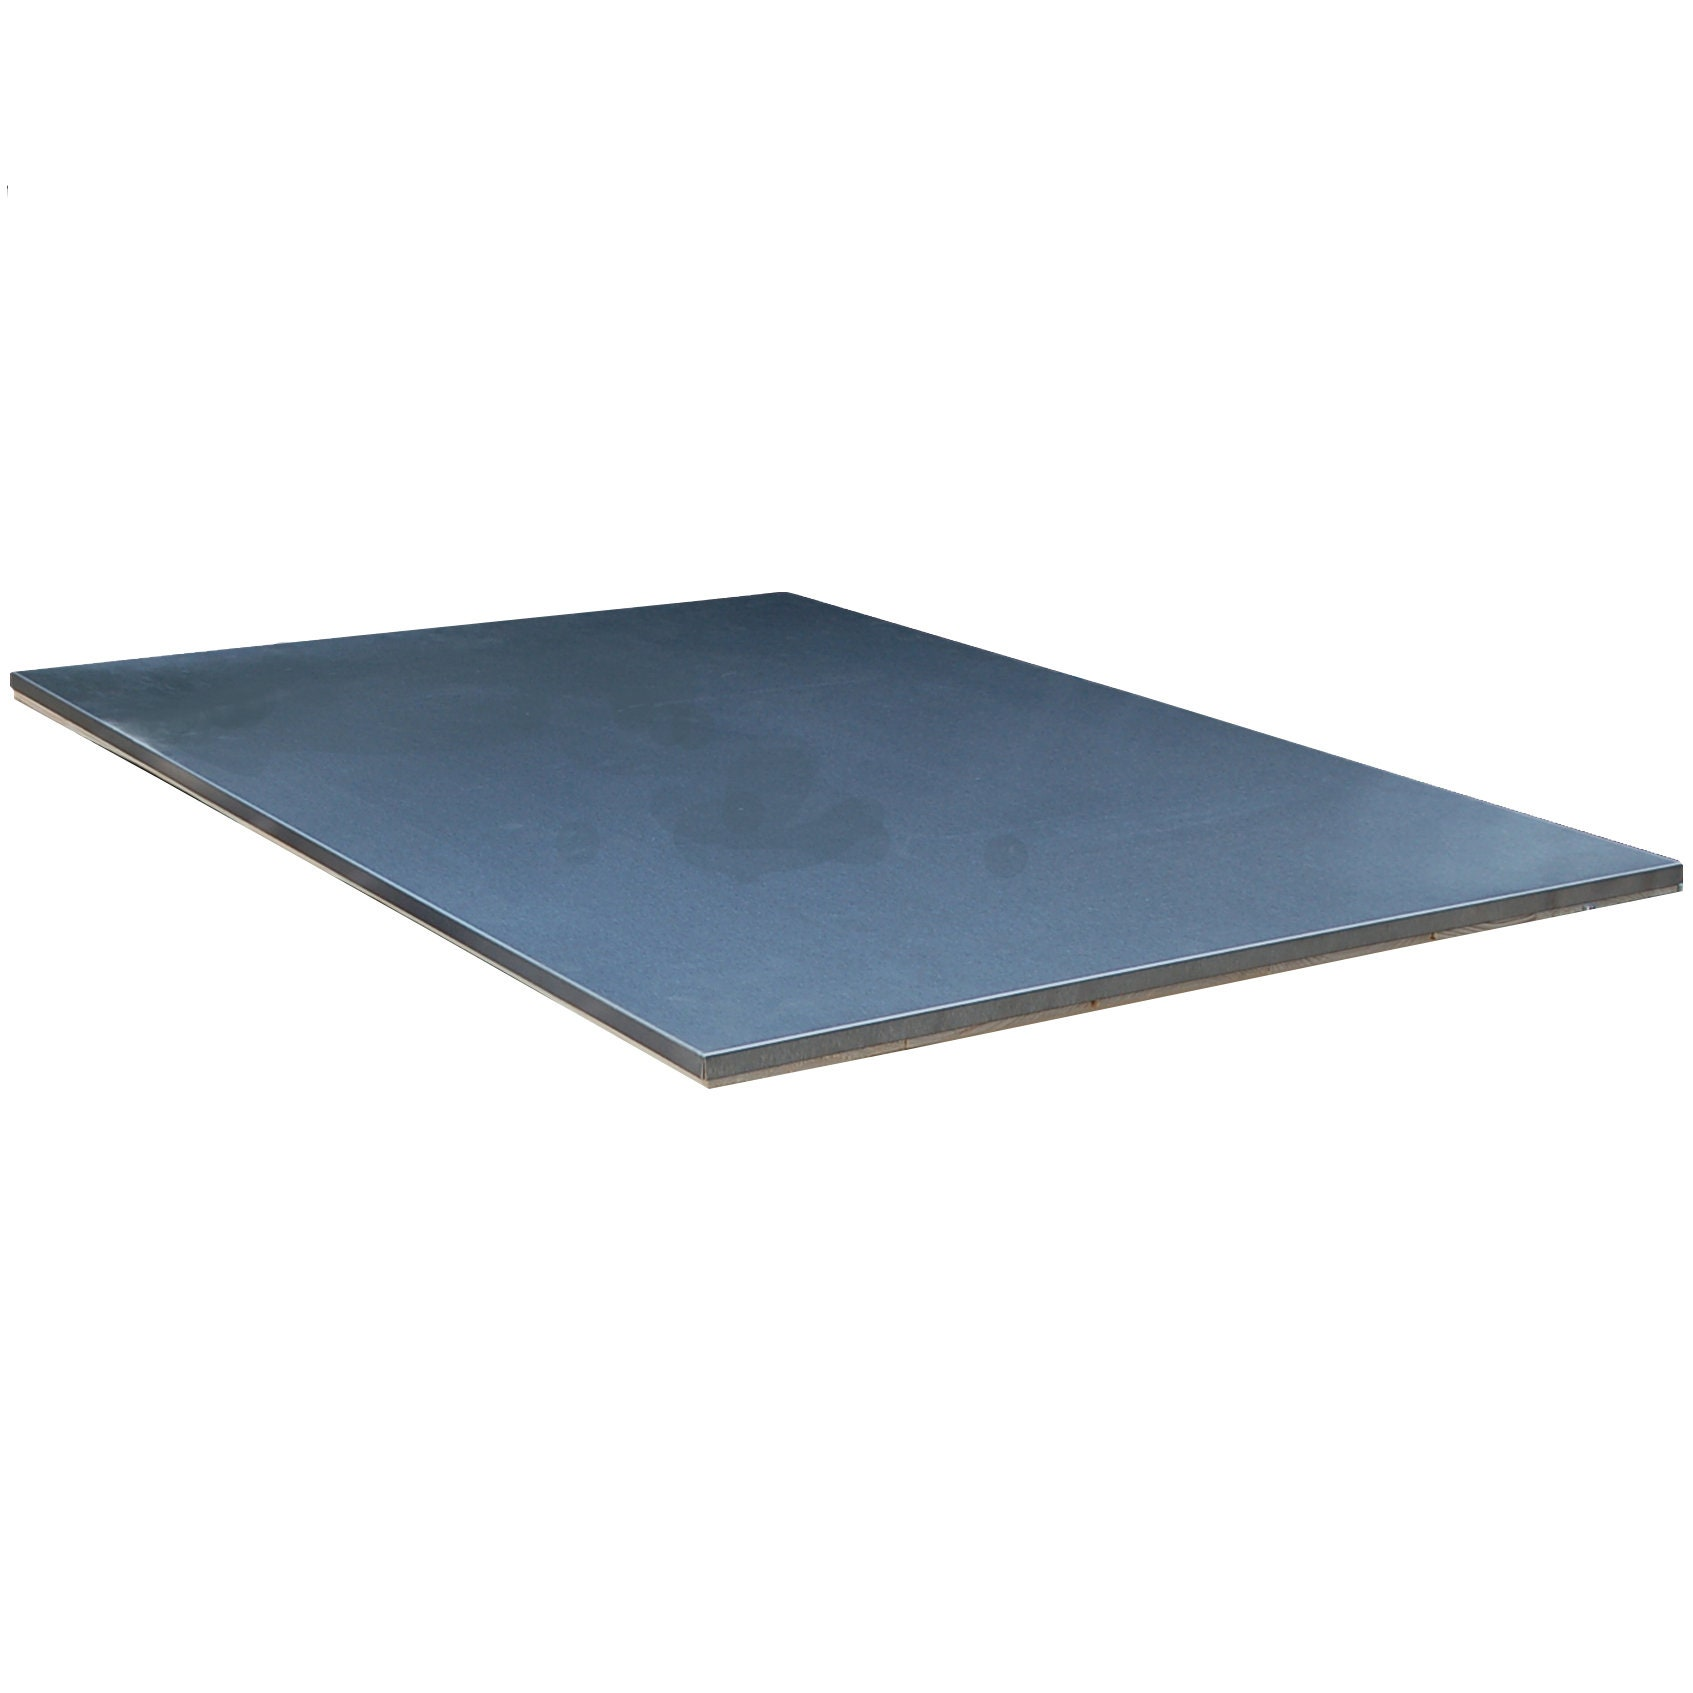 Palettenmobel Grilltisch Platte Steel Etsy